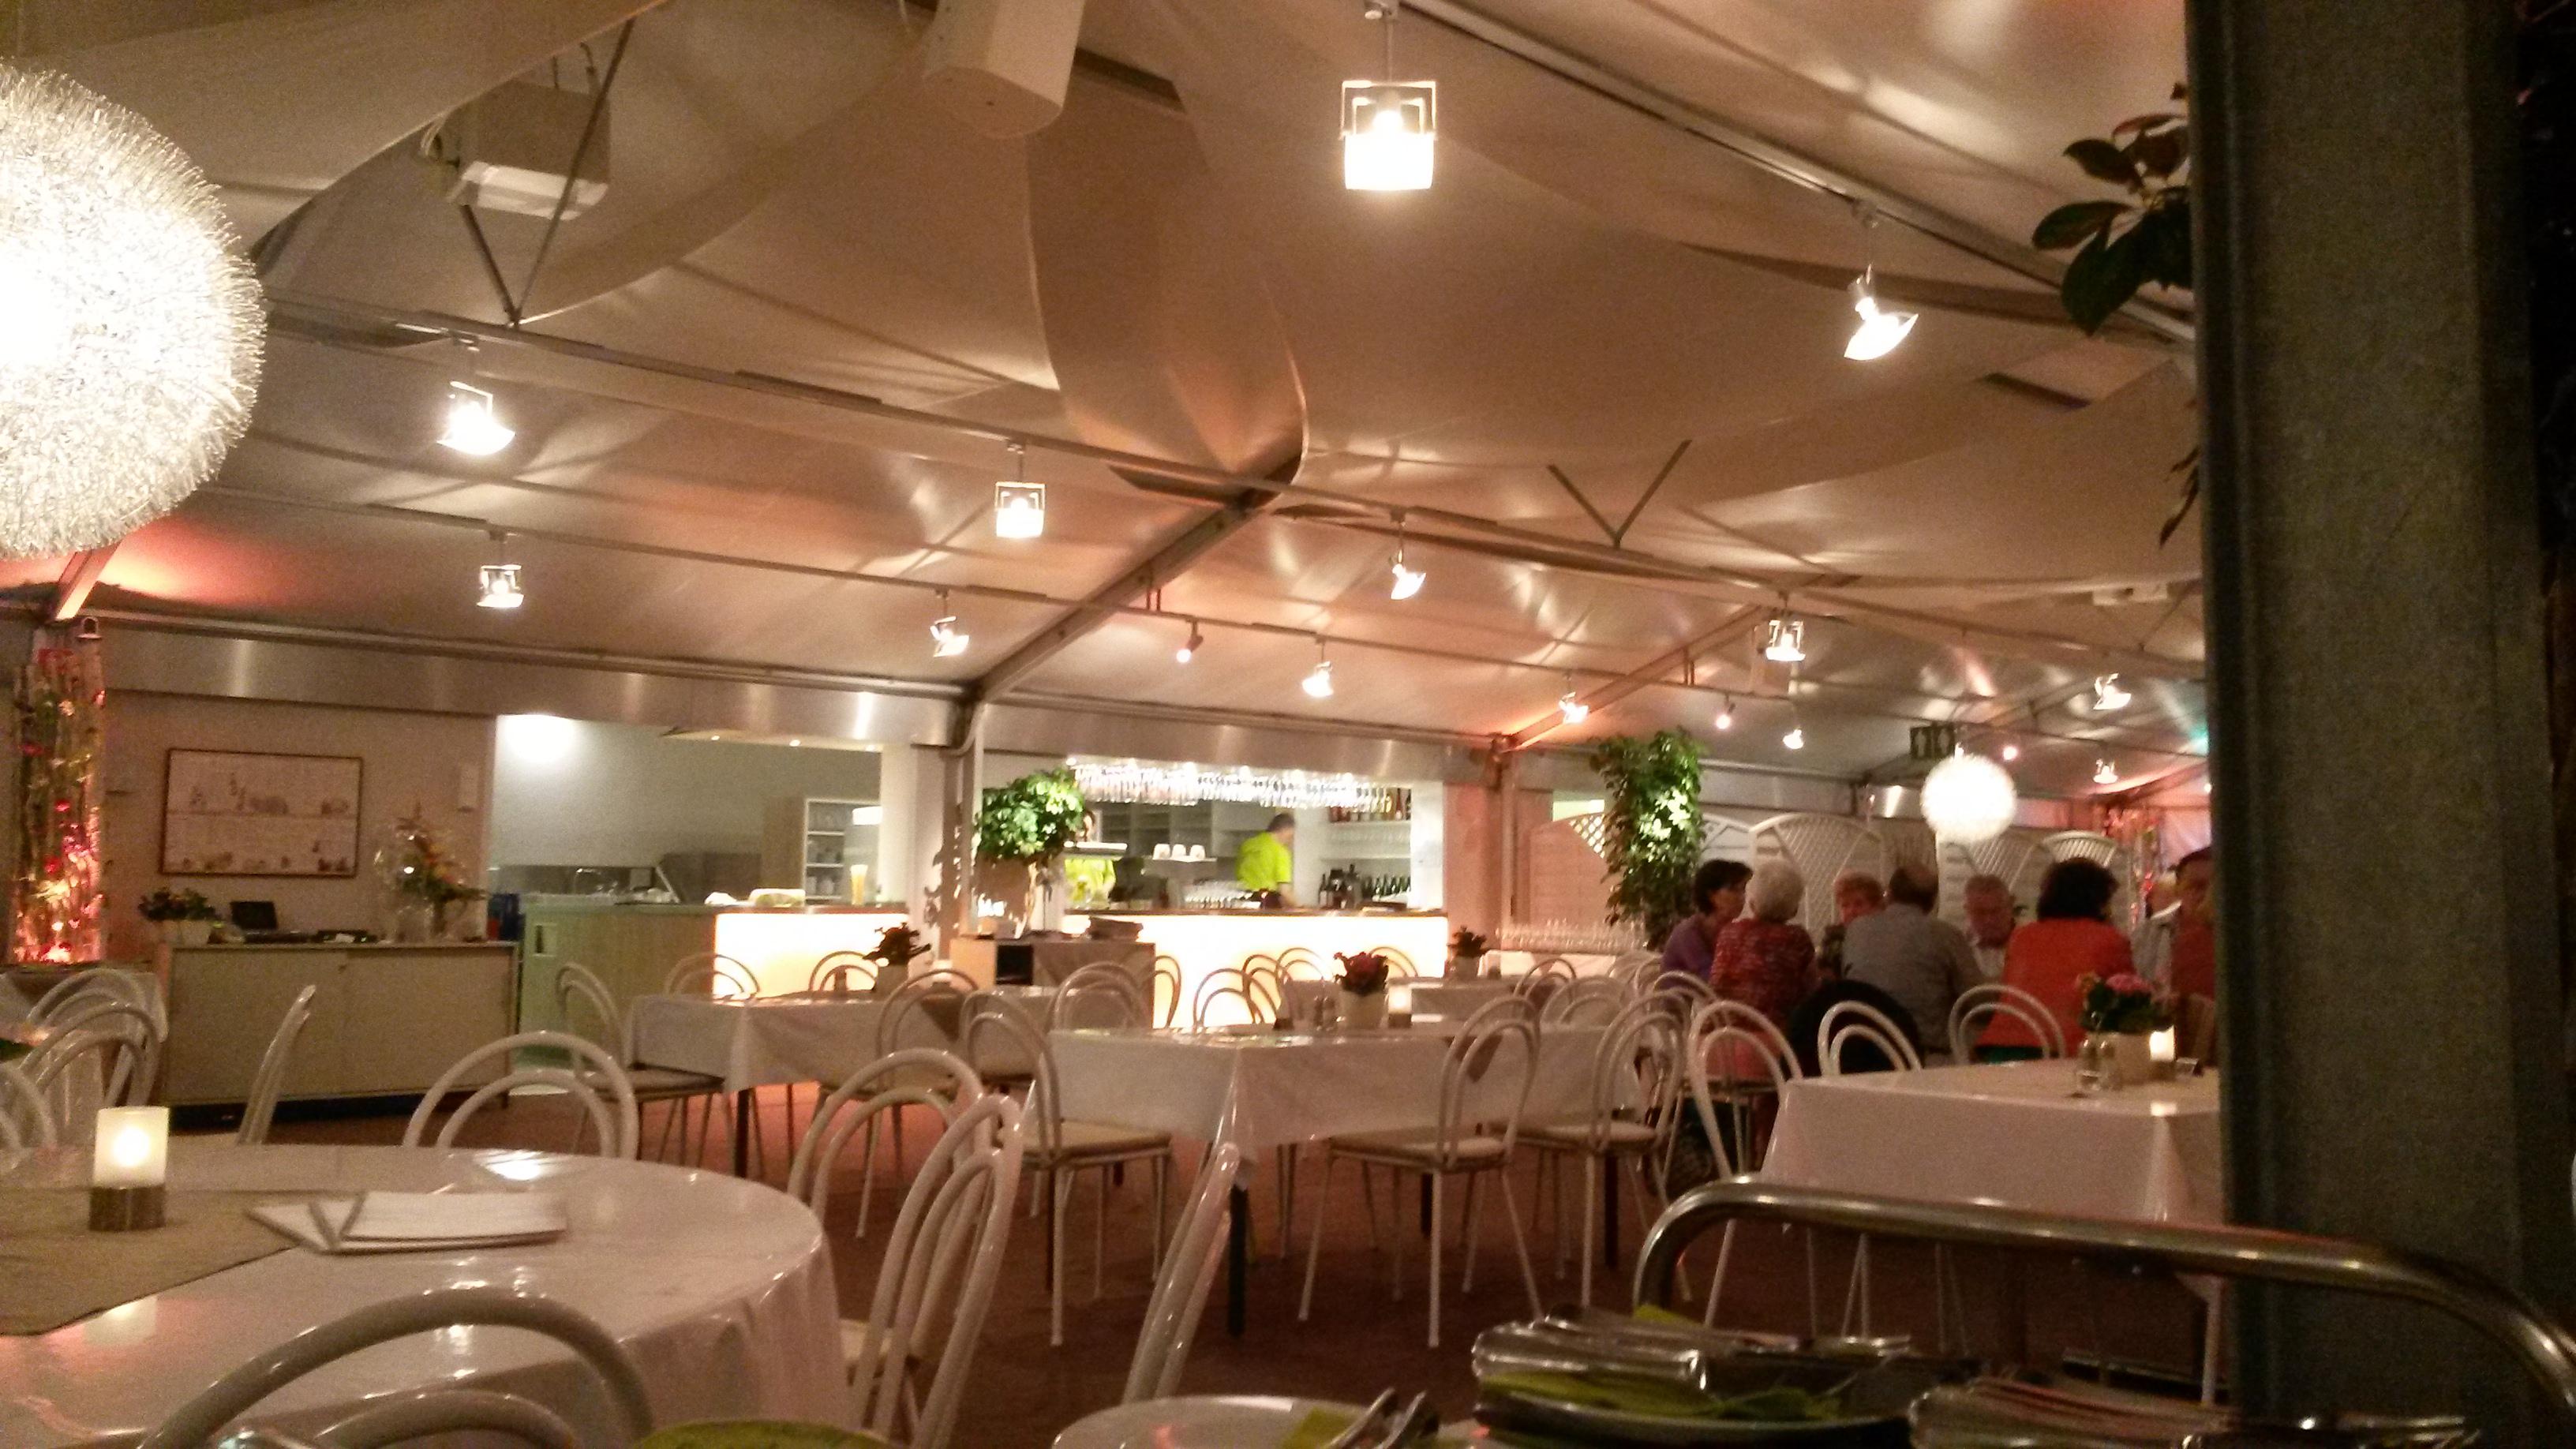 Spargelhof Böser Restaurant